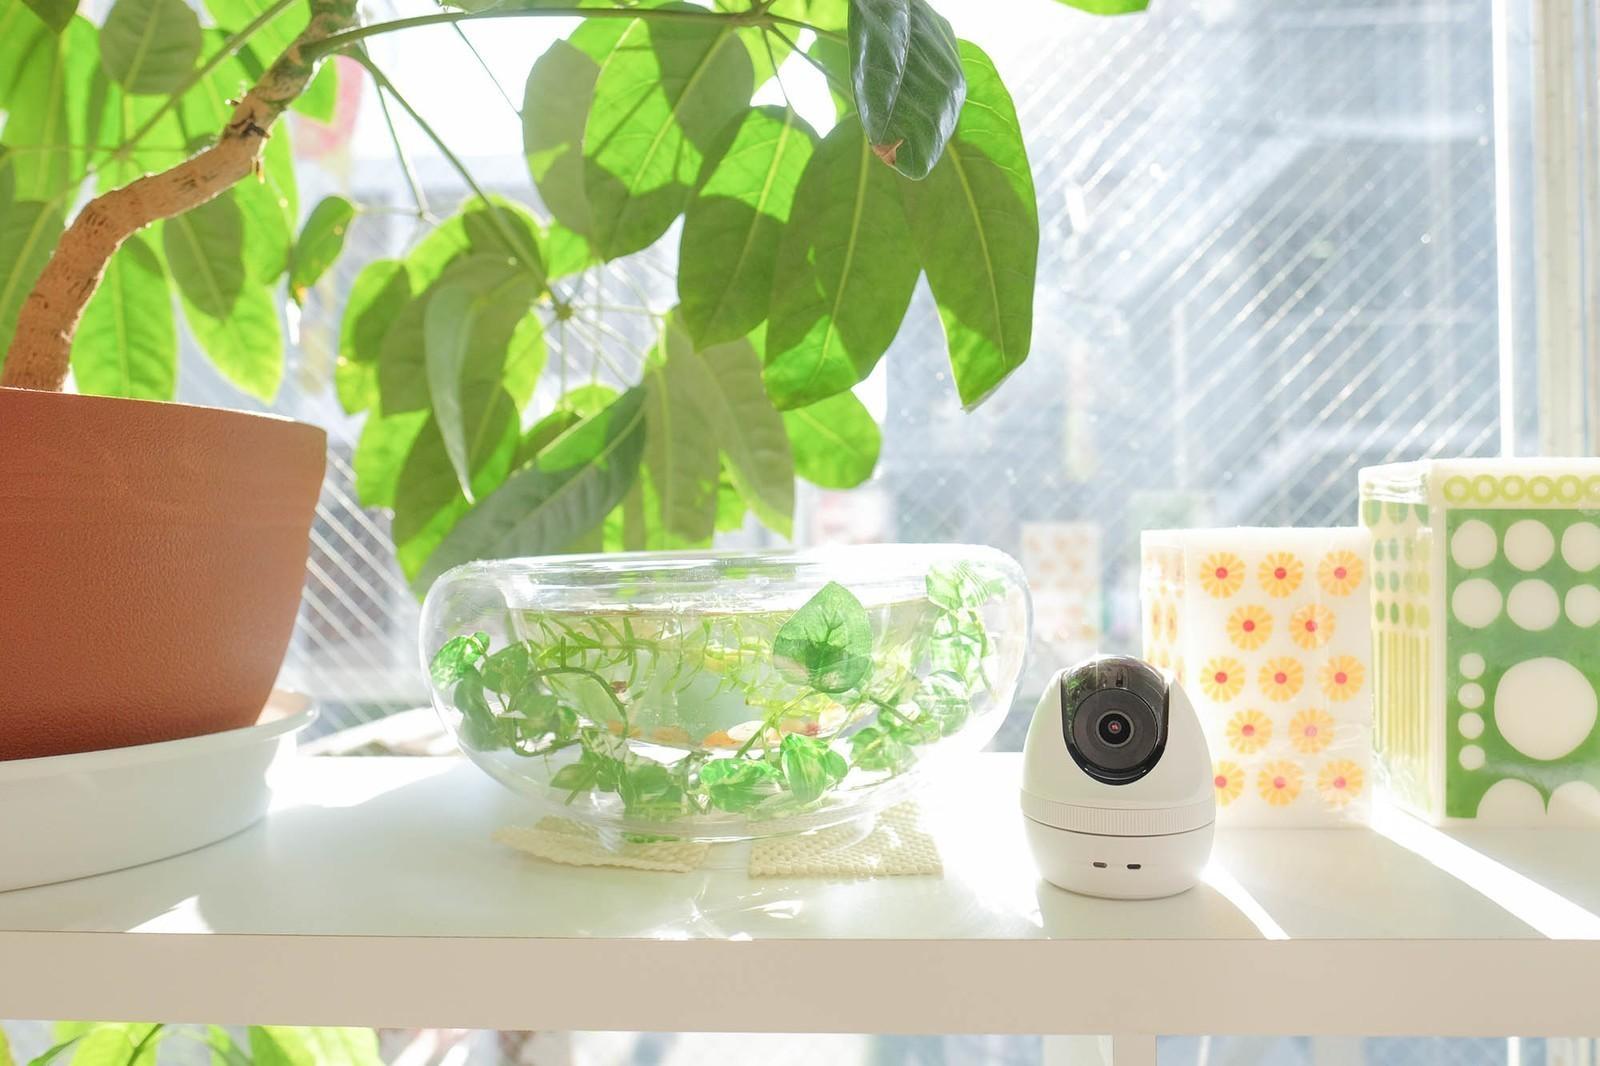 【iOS】スマホと監視カメラを活用、クラウド型セキュリティーサービス「Safie」のアプリエンジニアを募集!